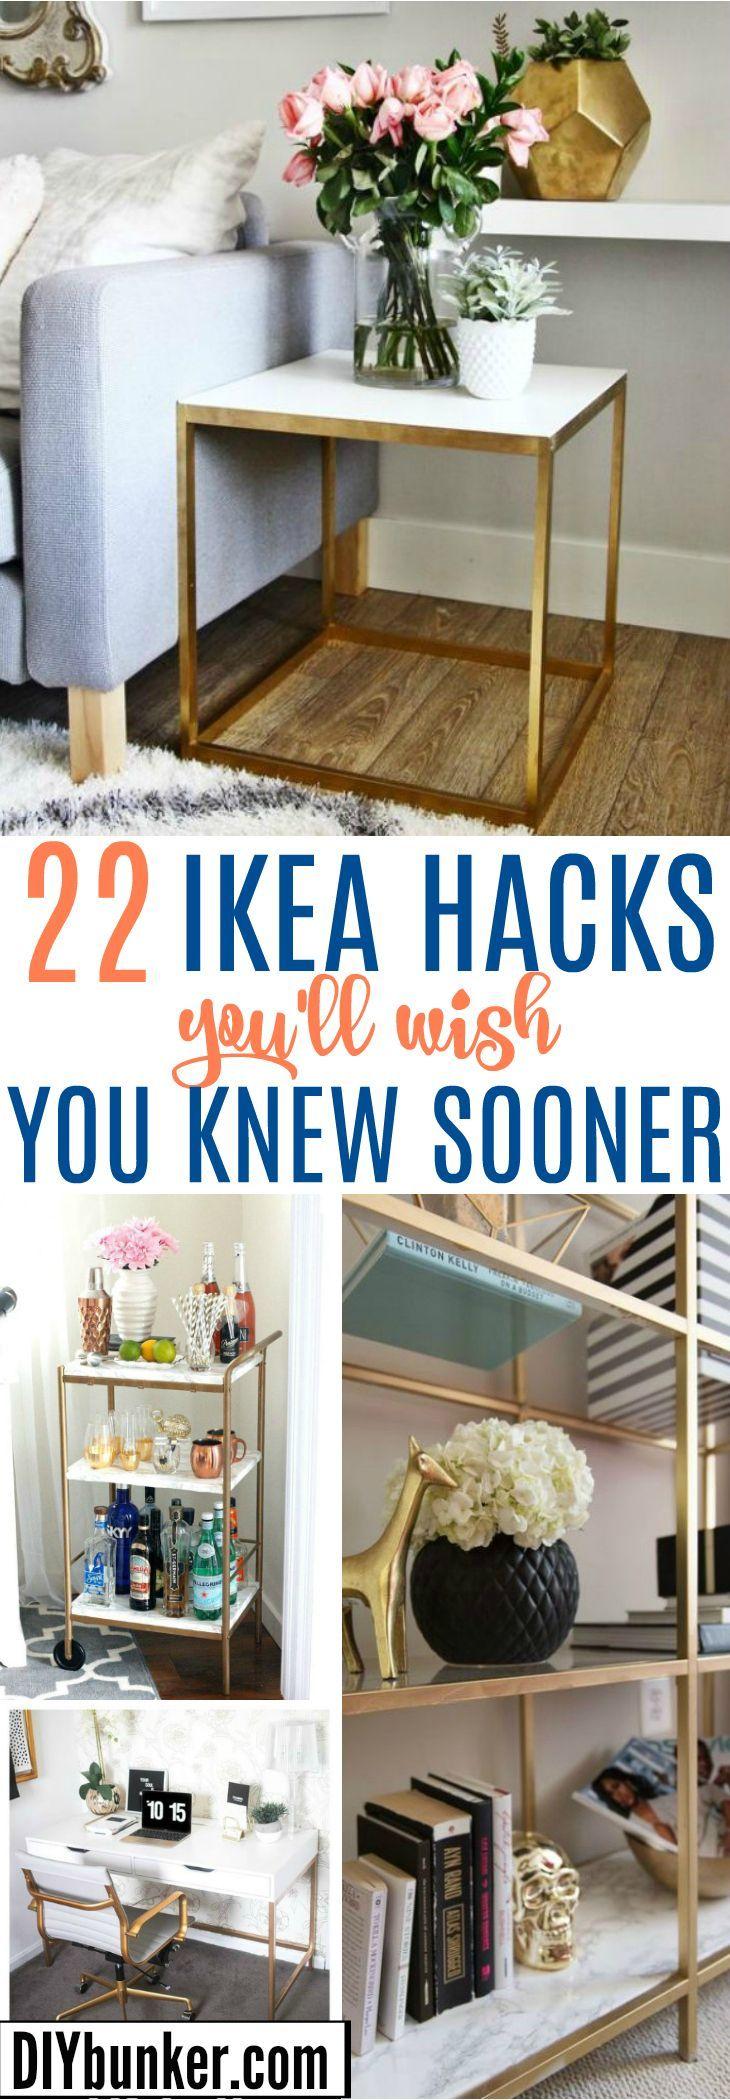 Ikea Hacks: Furniture DIYs That'll Save You so Much Money